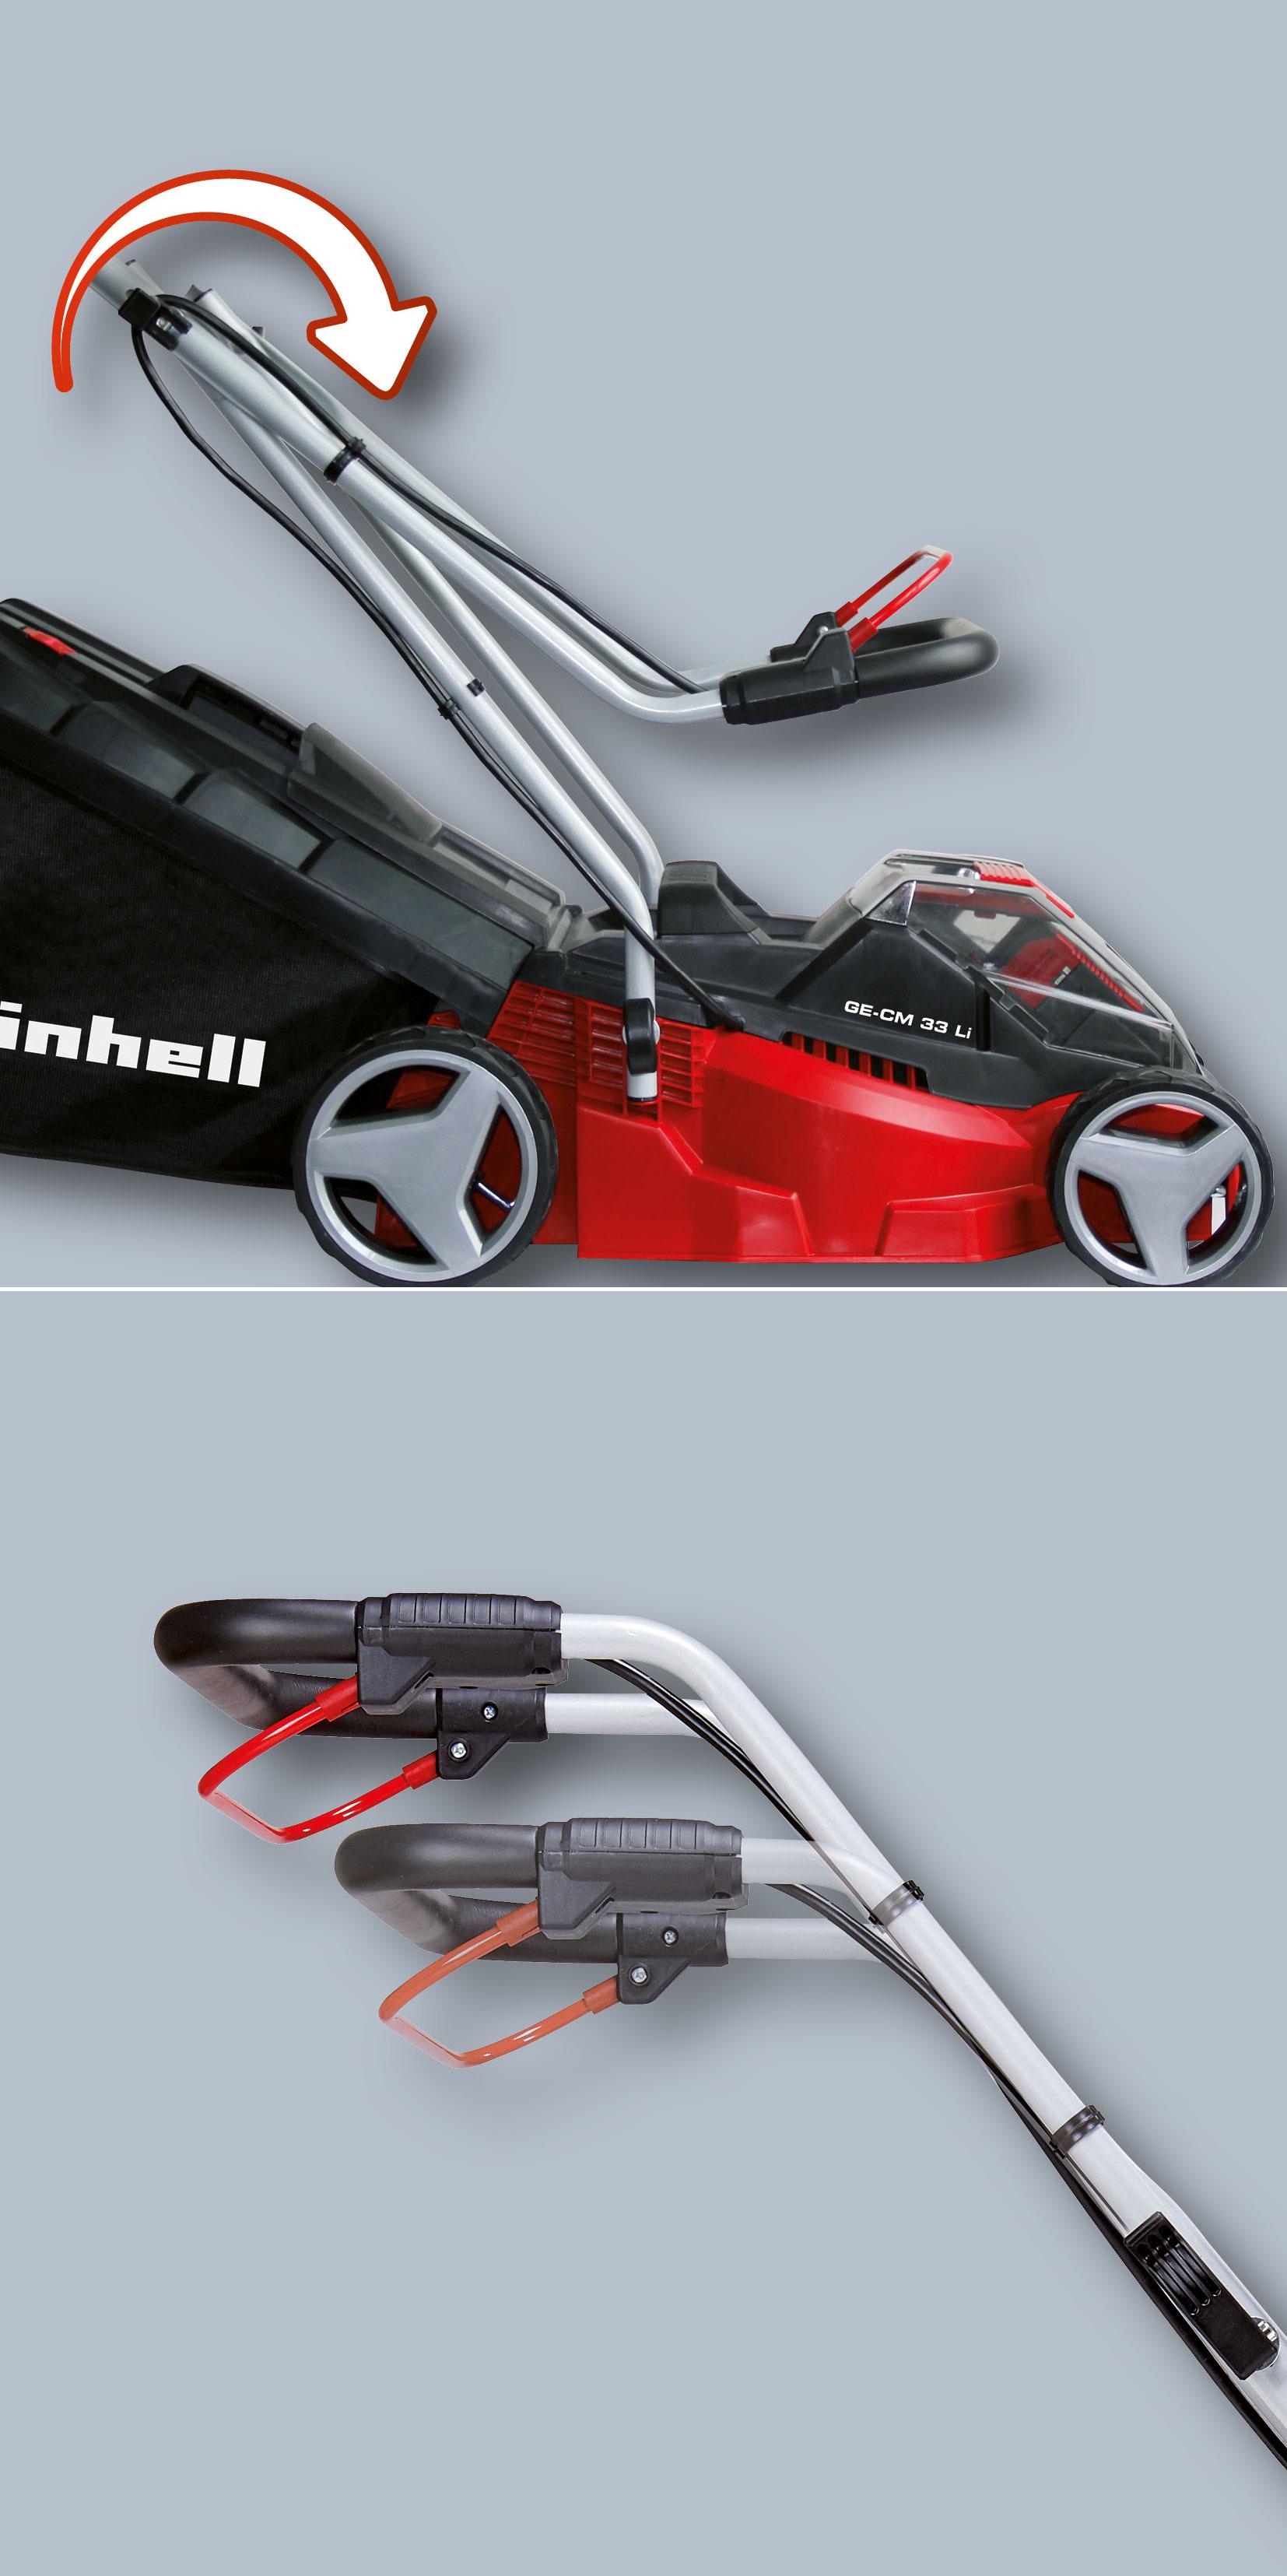 Einhell Akku-Rasenmäher GE-CM 33 Li Kit Power X-Change SB 33cm Bild 2